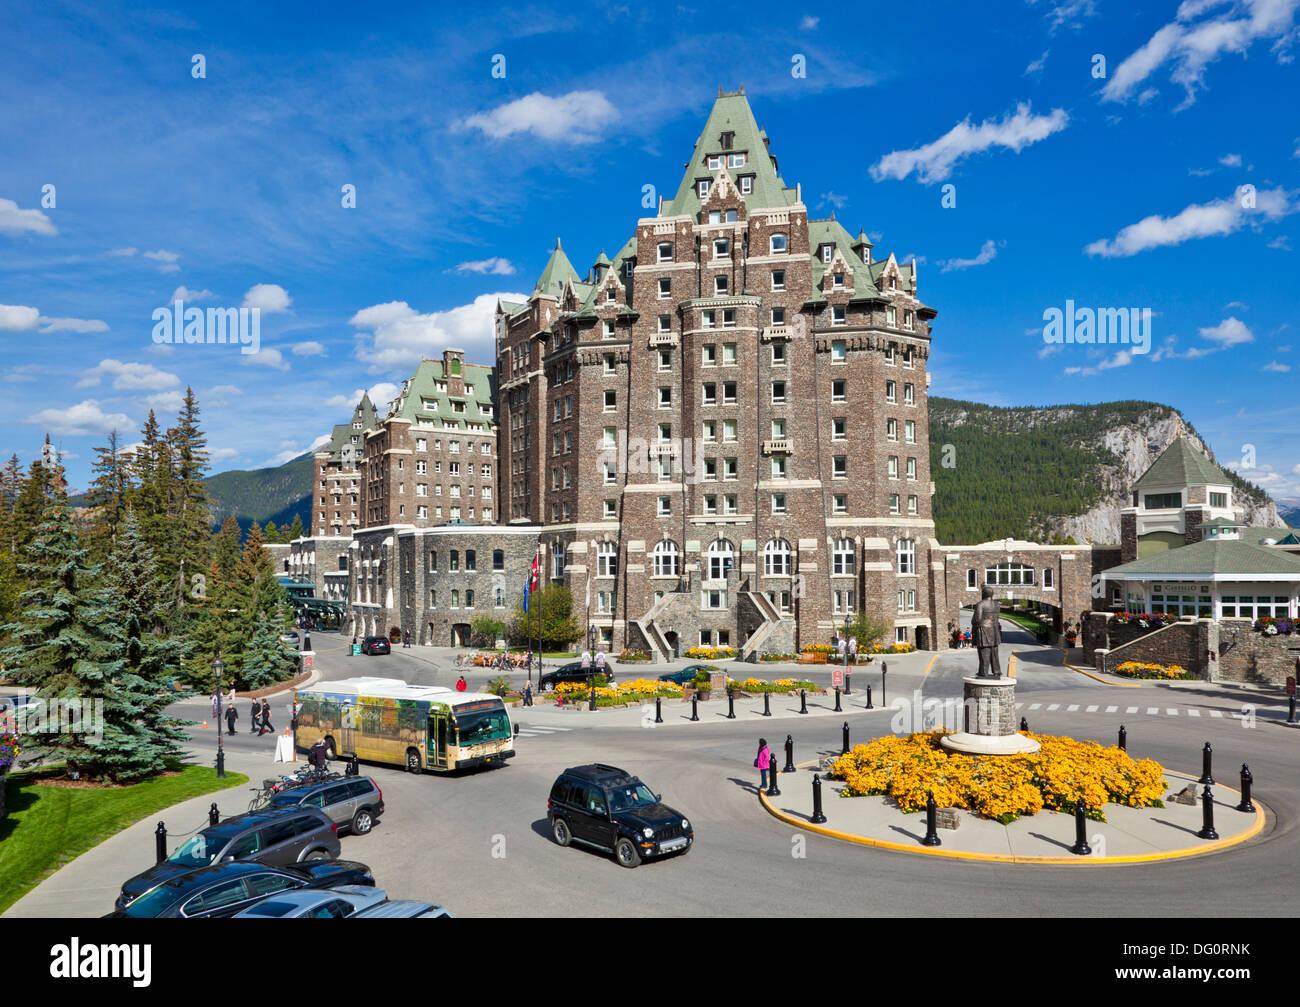 Stock photo the fairmont banff springs hotel banff township banff national park alberta canada canadian rockies